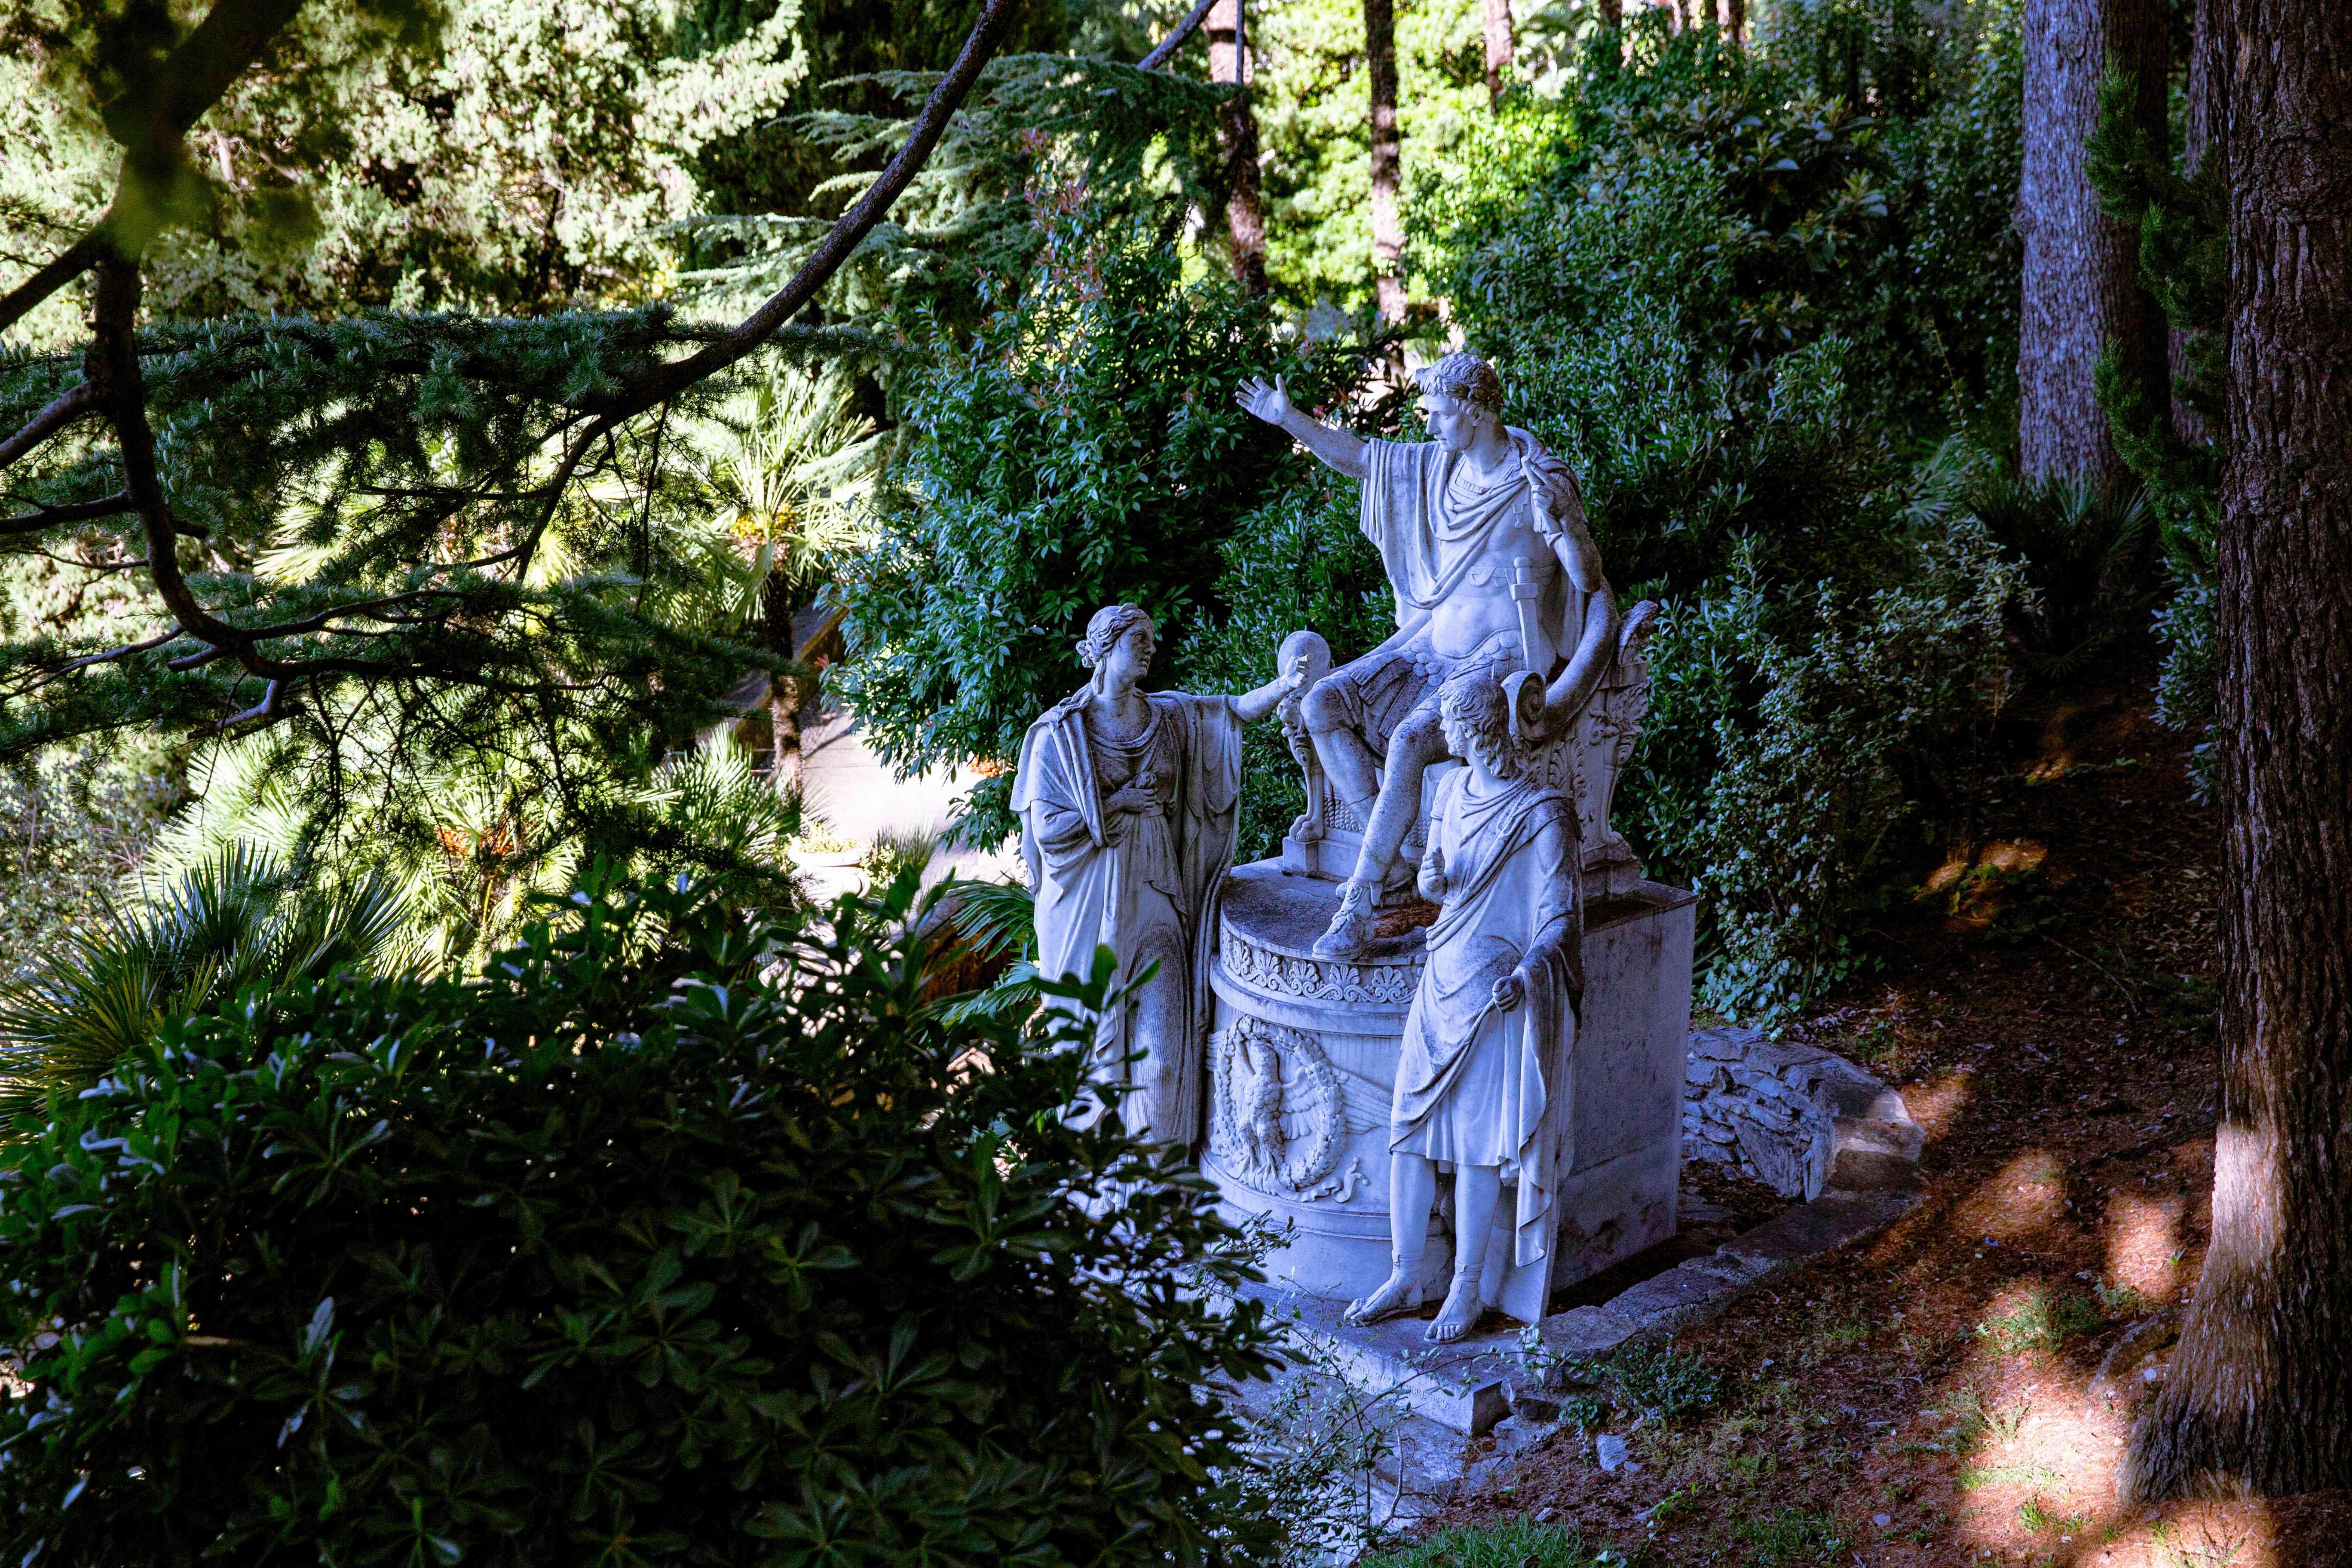 Gardens of Villa Monastero in Varenna, Italy